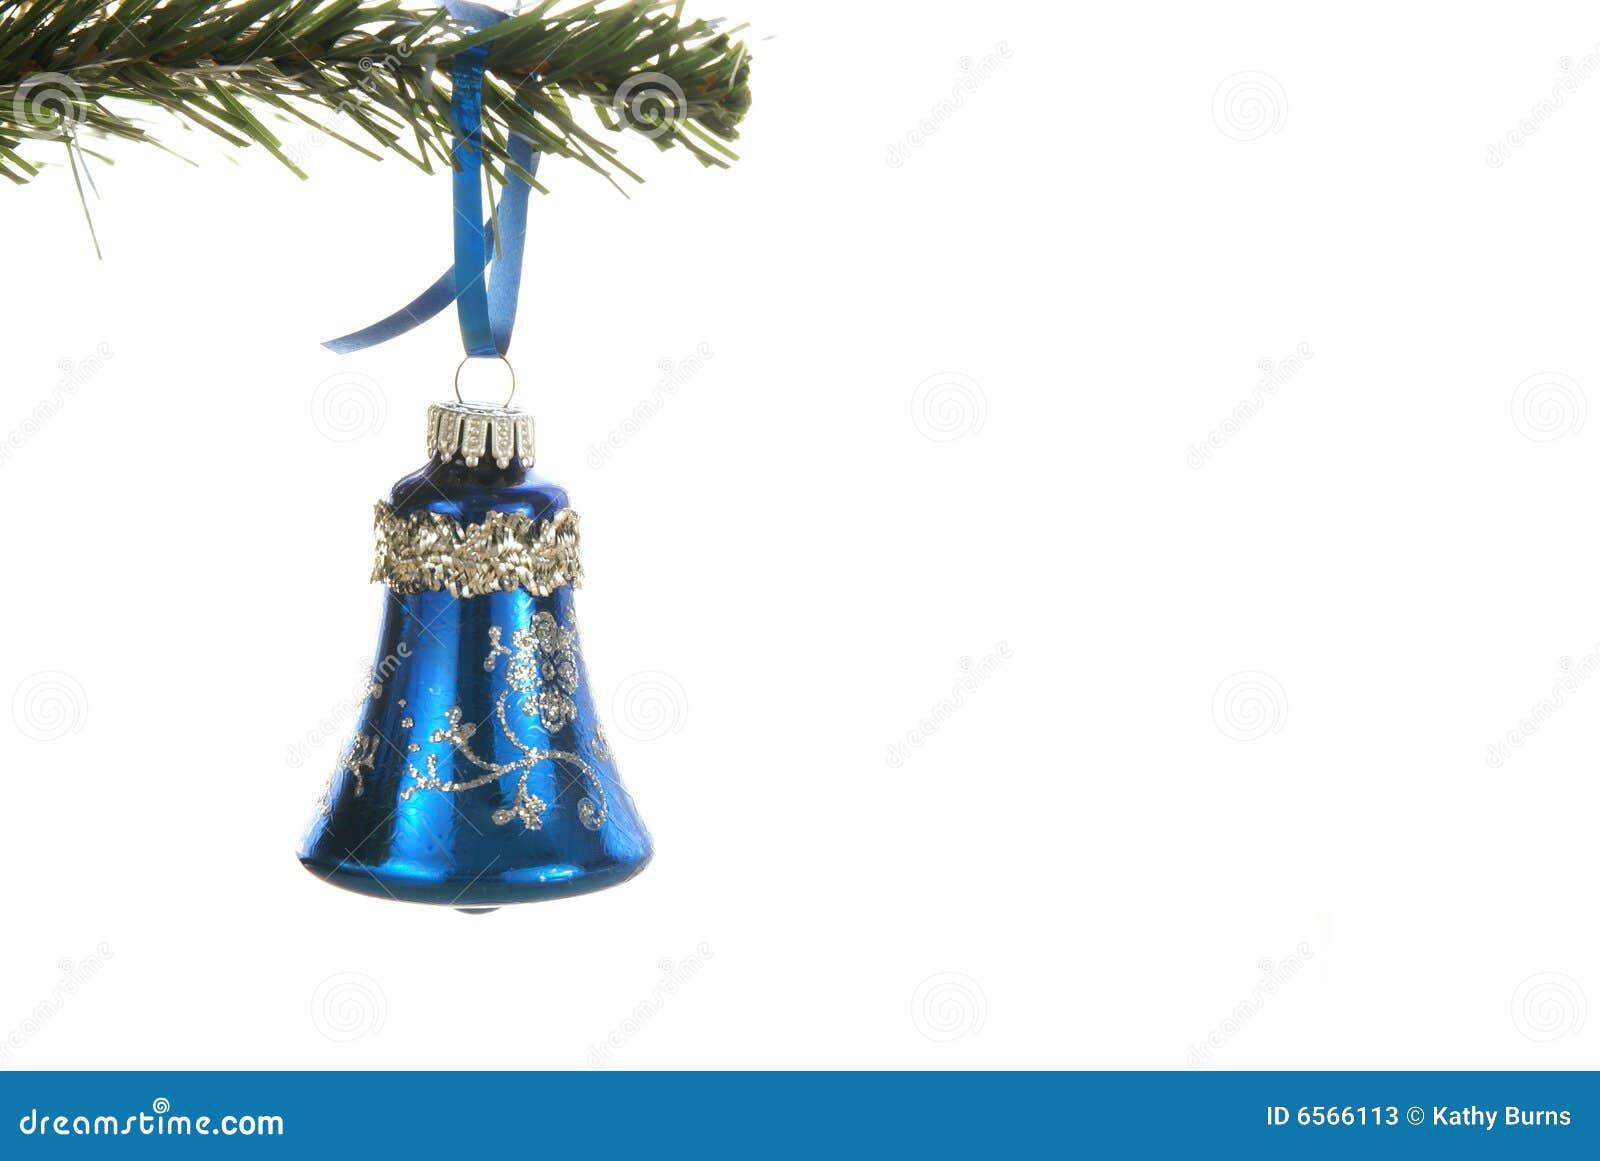 Bell christmas ornament - Blue Christmas Ornament